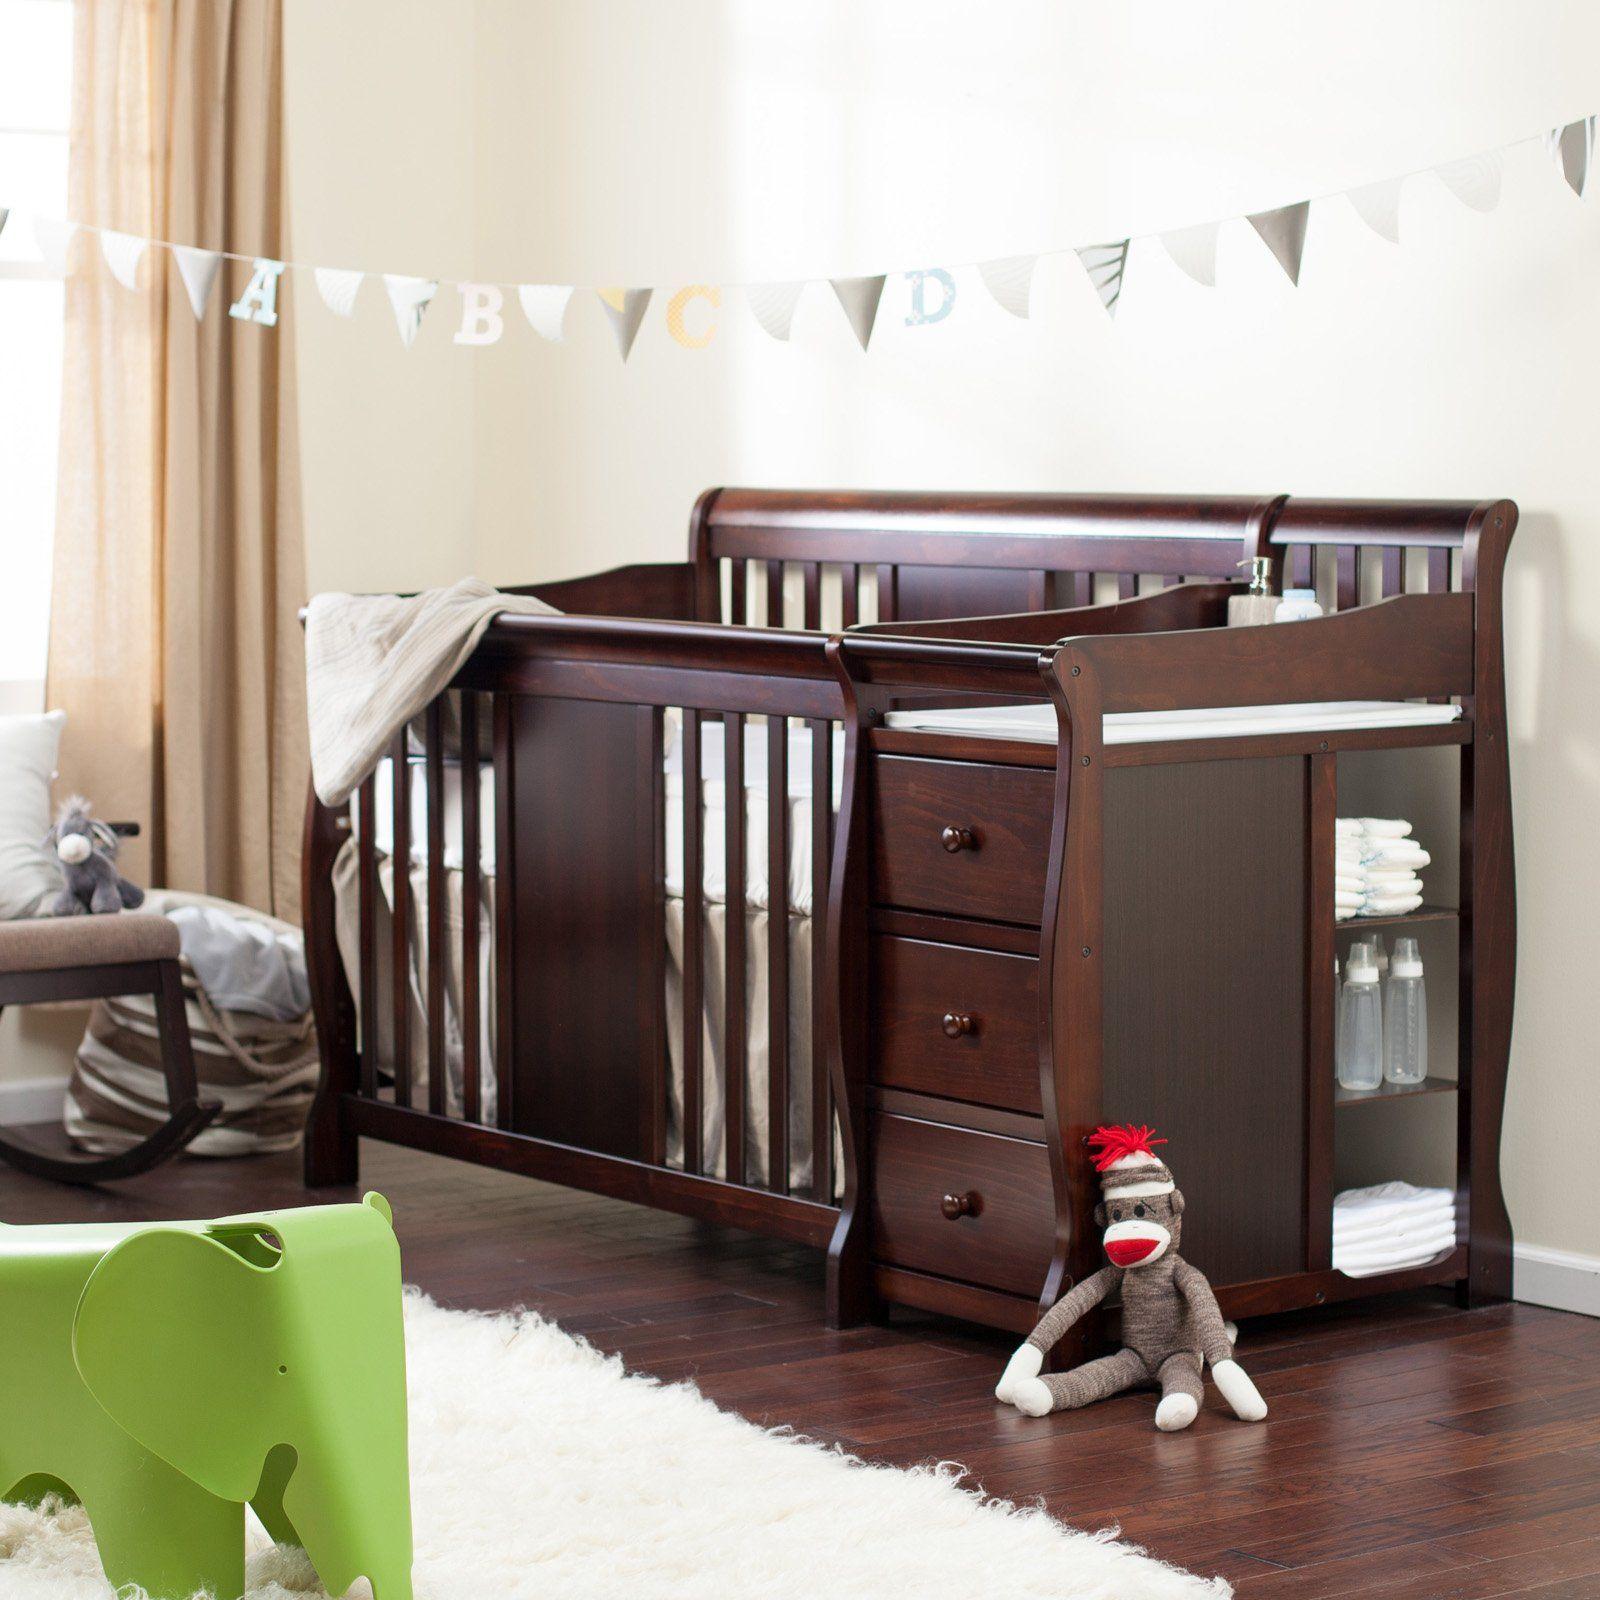 nursery furniture sets baby furniture room ideas baby ideas baby room